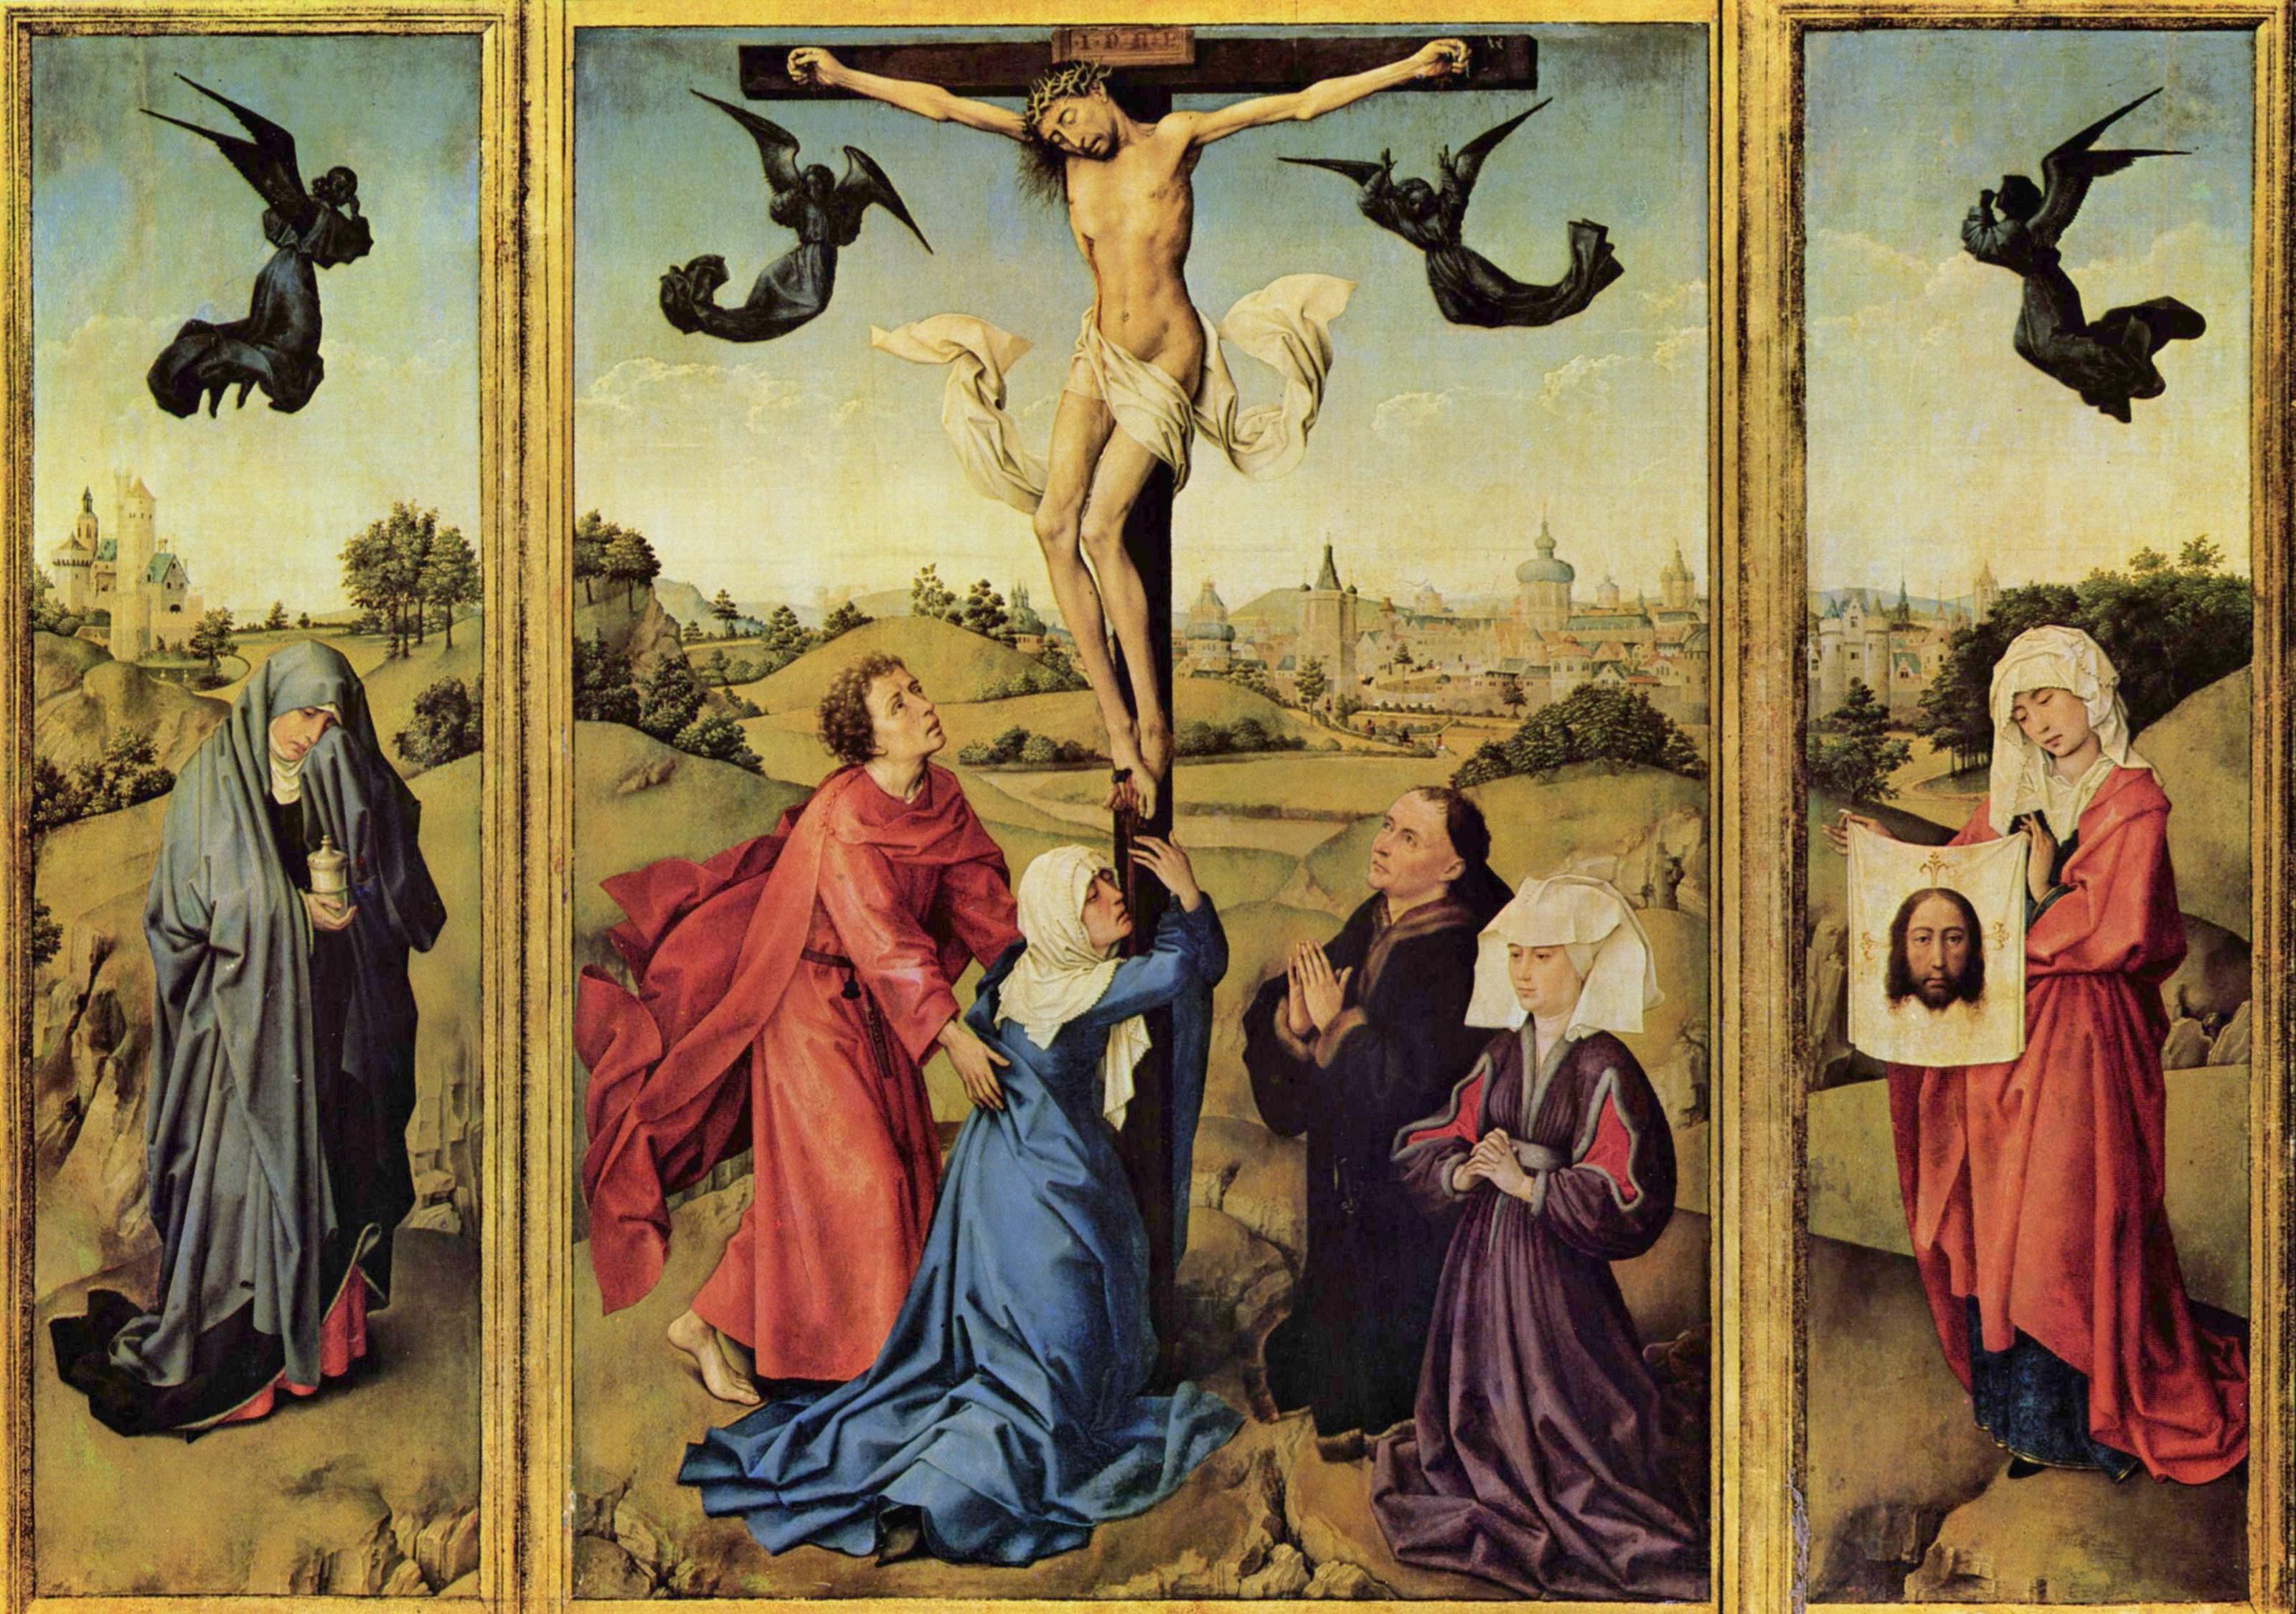 Fișier:Rogier van der Weyden 017.jpg - Wikipedia